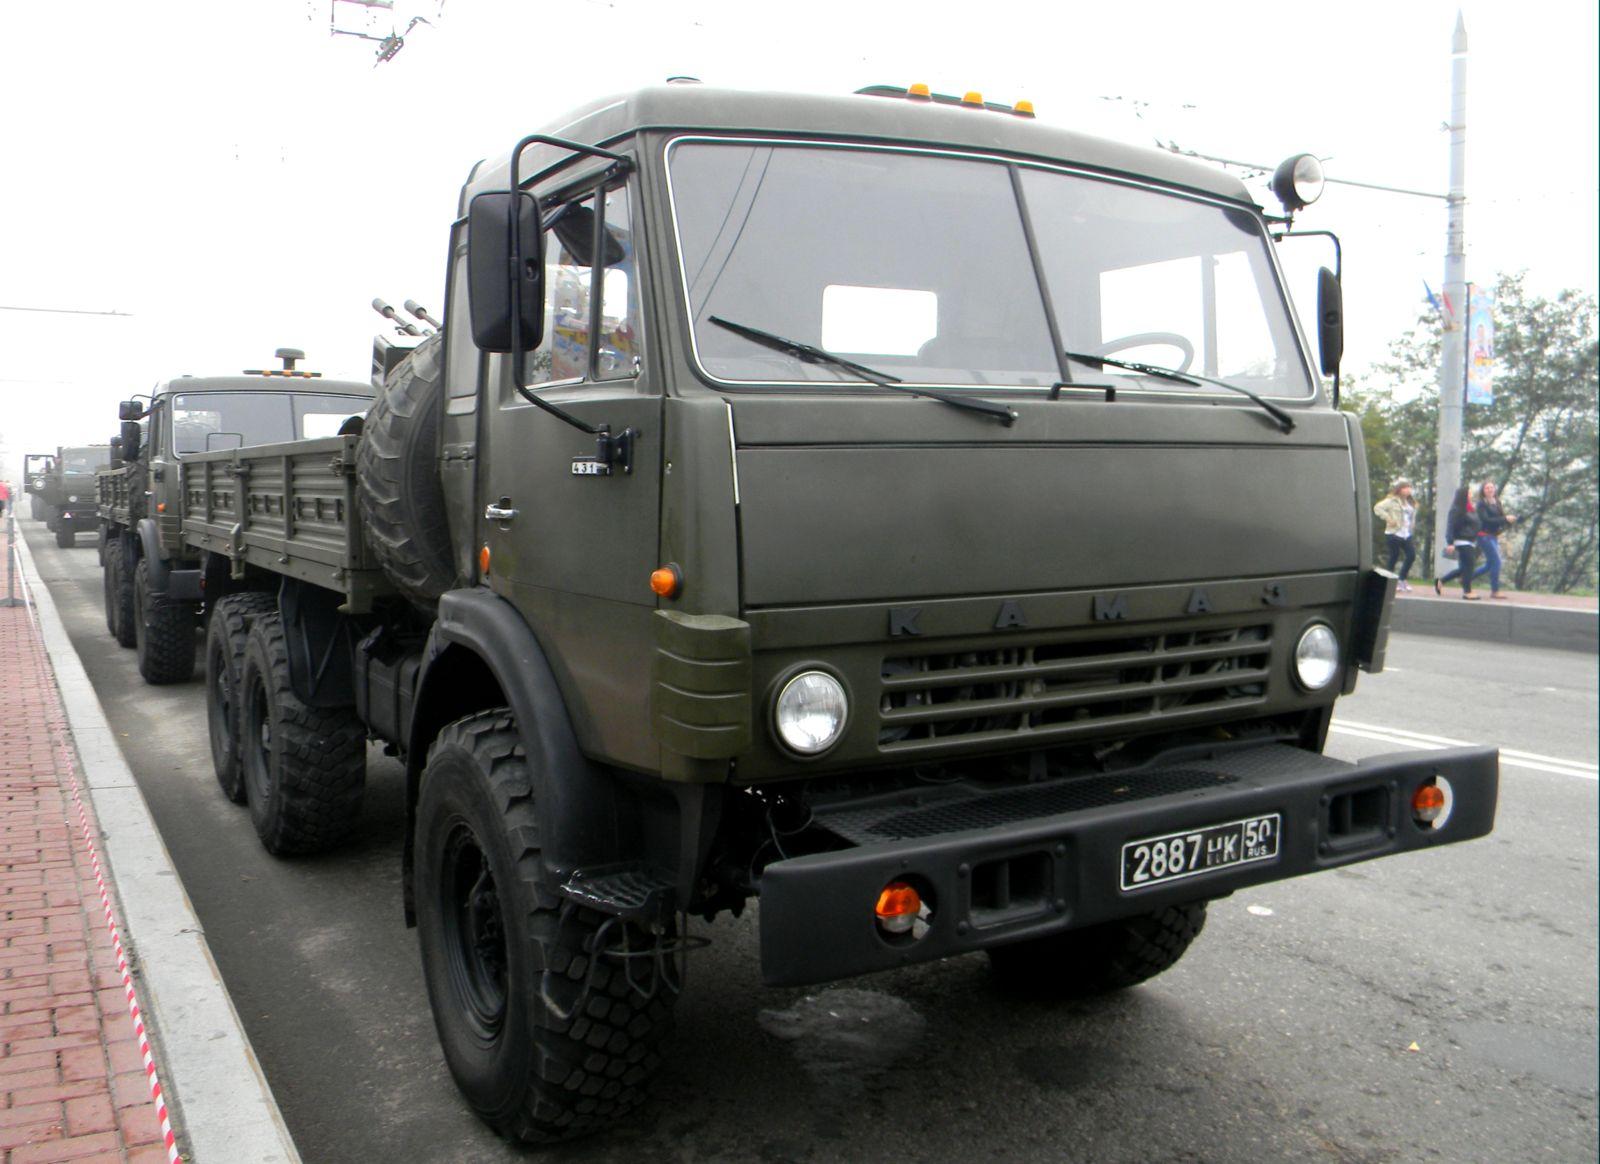 КамАЗ-43114 с открытым кузовом